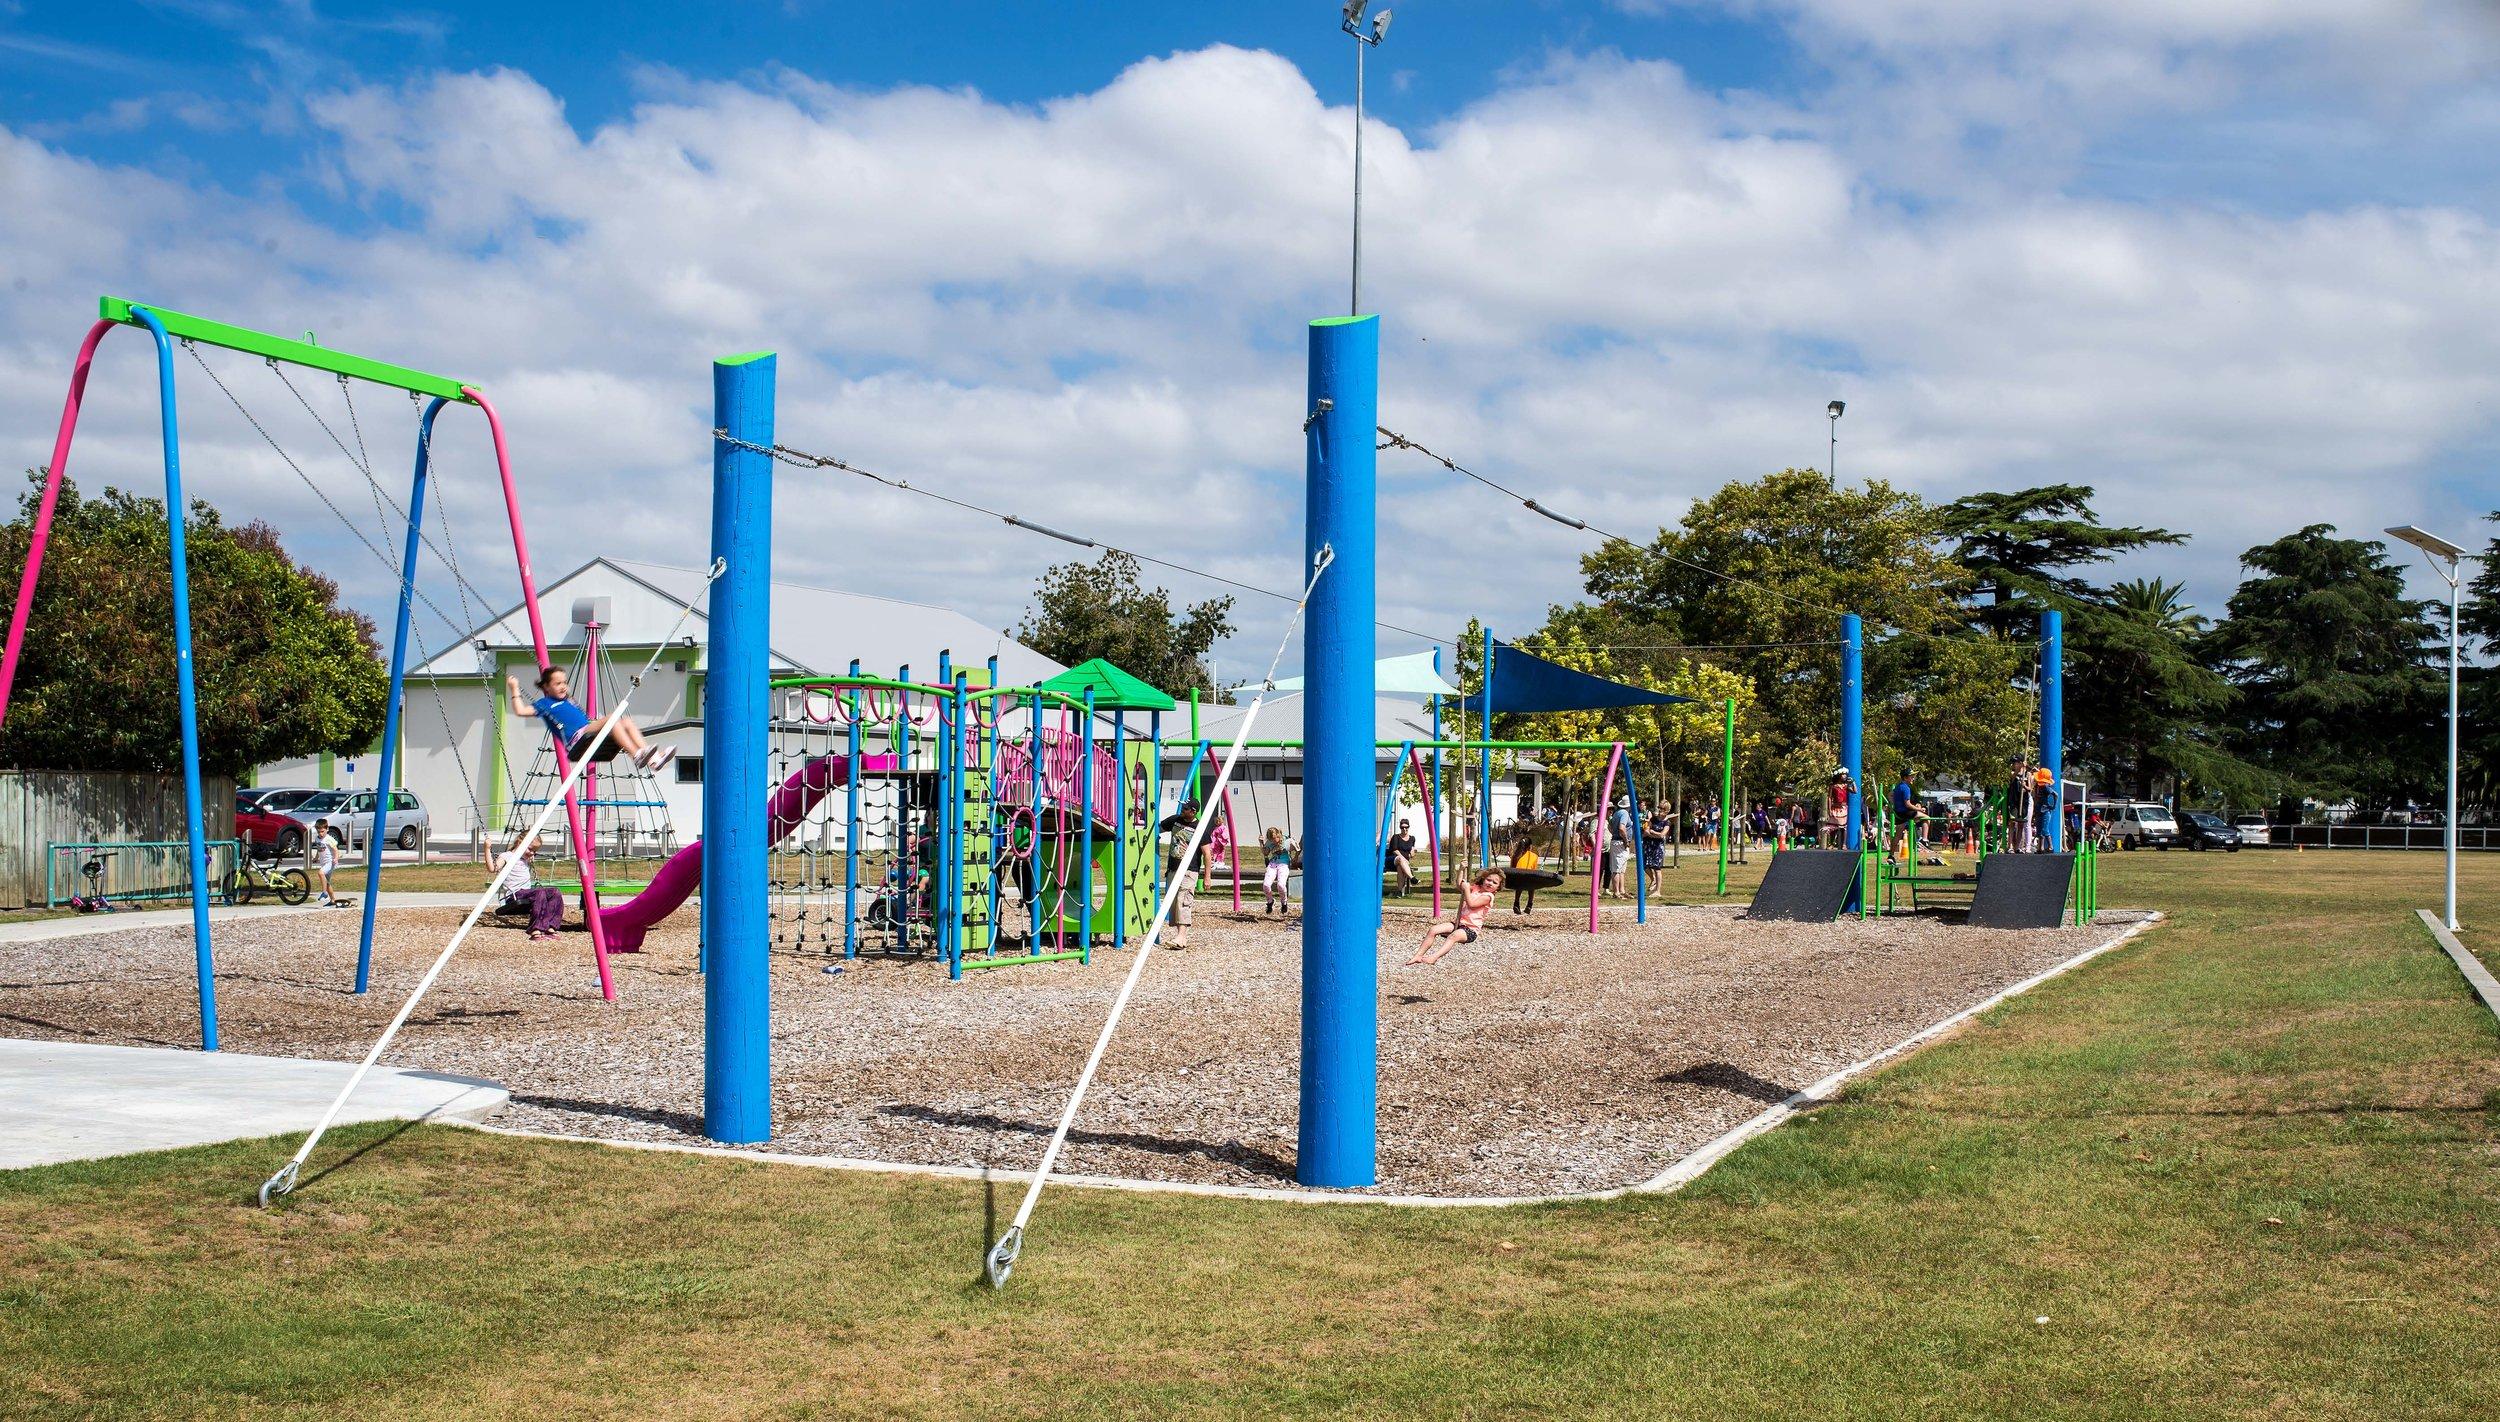 Russell Park Playground